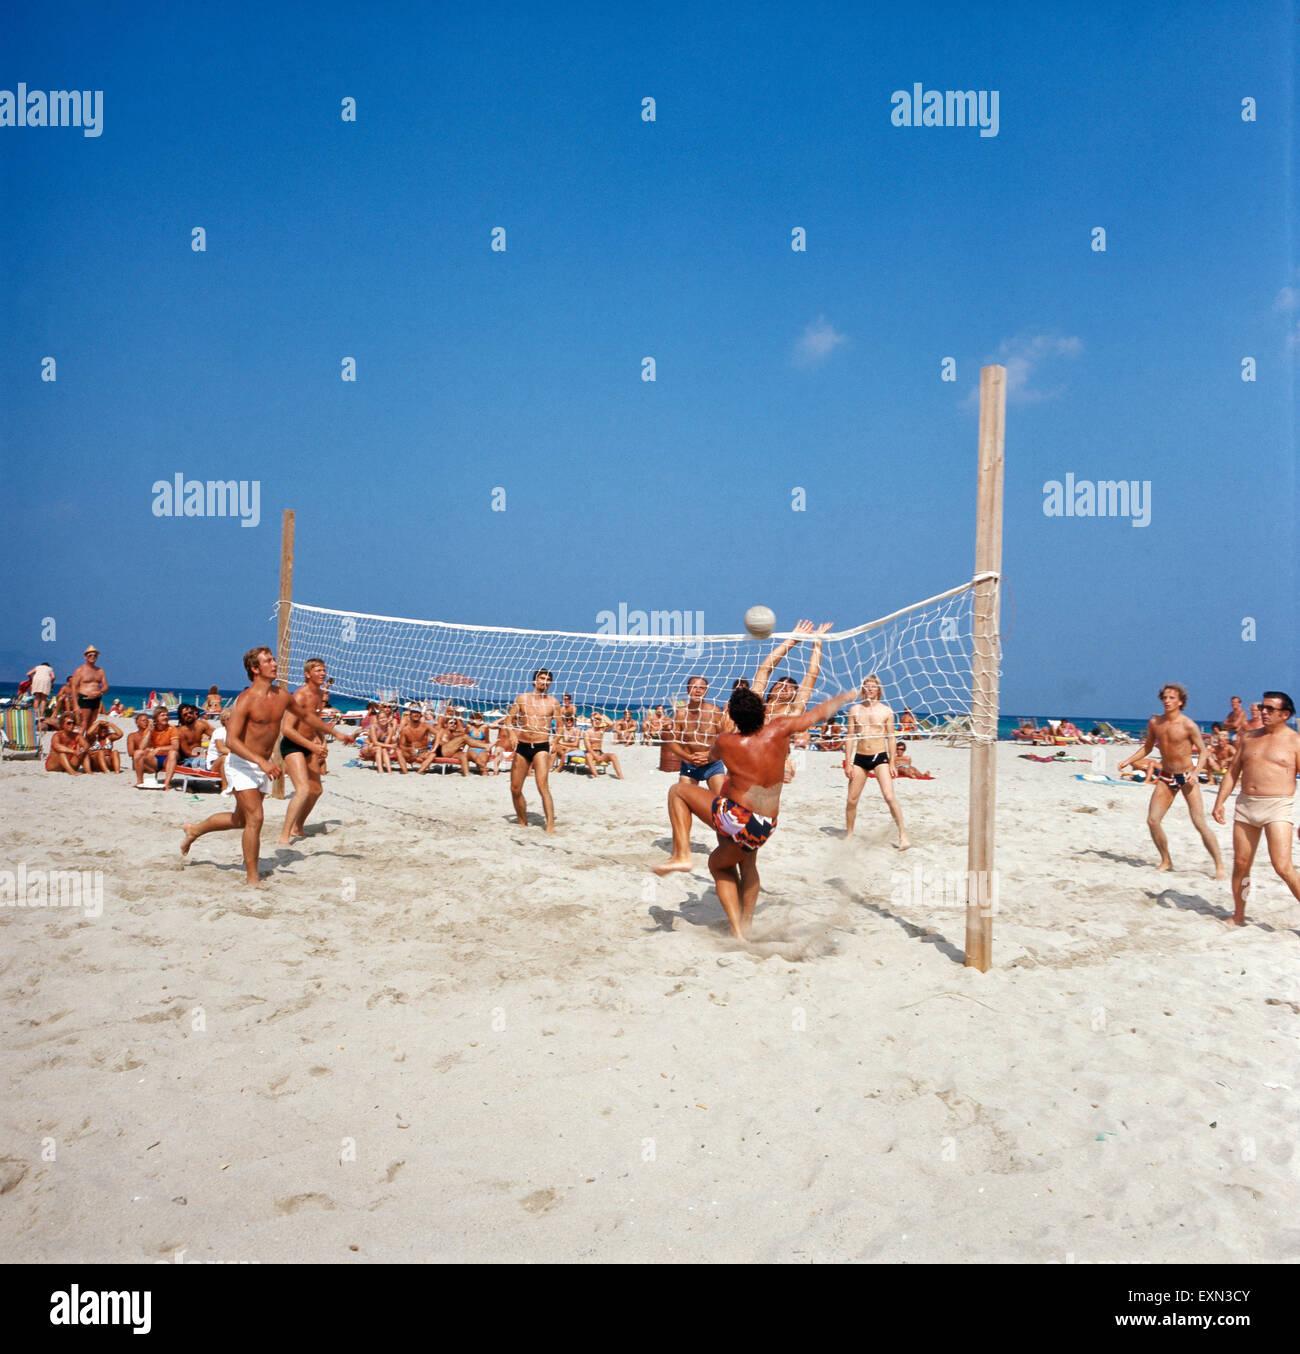 Sportliche Wettkämpfe am Strand von Club Maryland auf Formentera, Ibiza 1976. Ssporting competitions at the - Stock Image